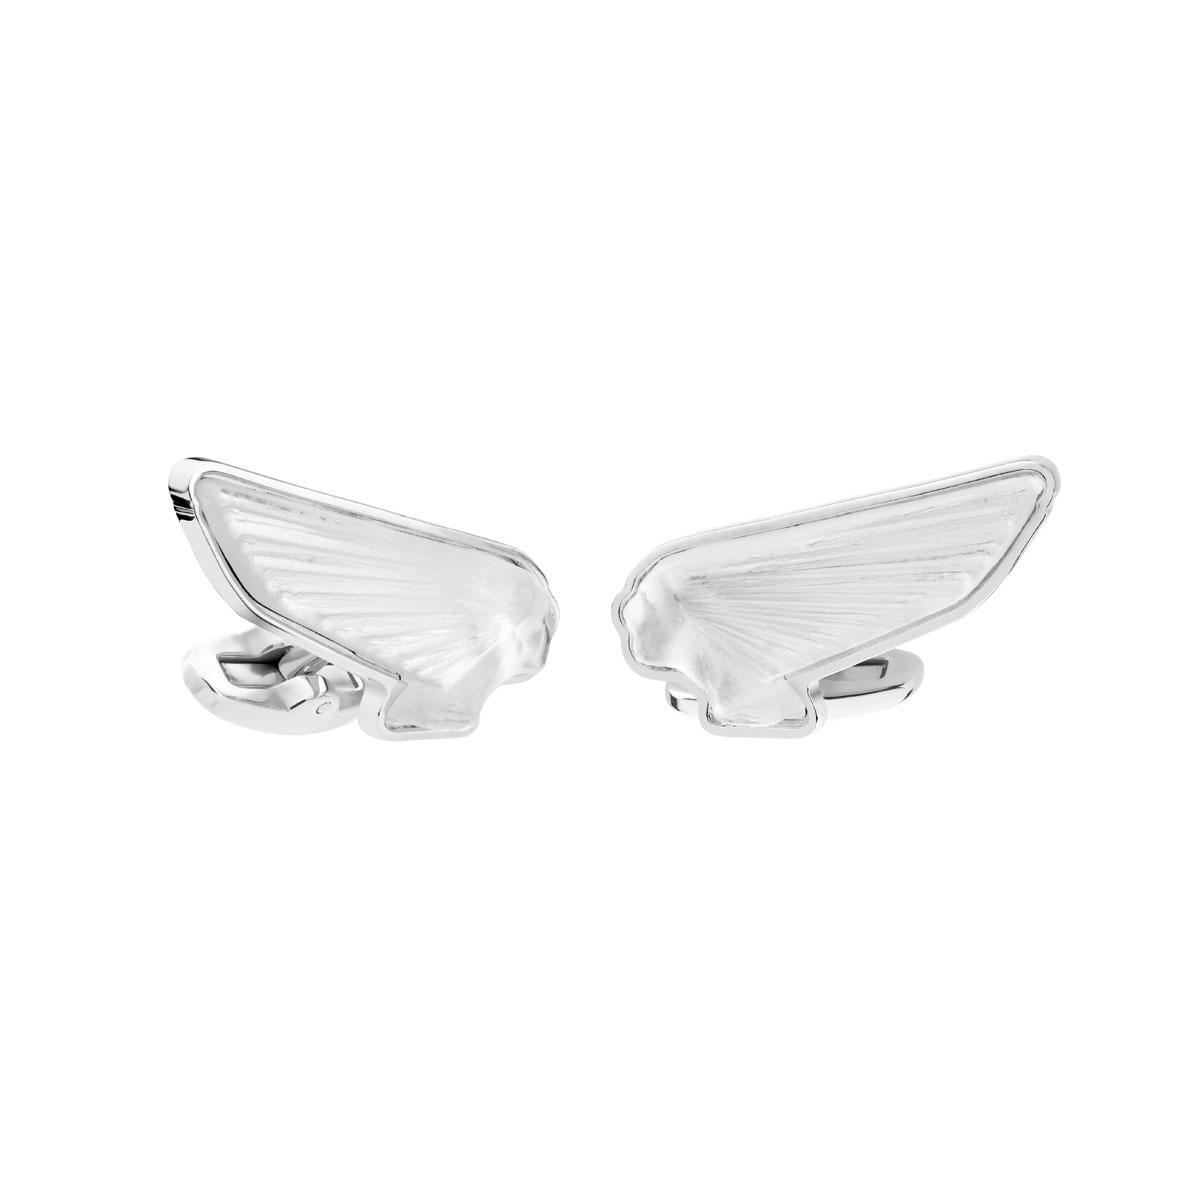 Lalique Victoire Mascottes Cufflinks Pair, Clear